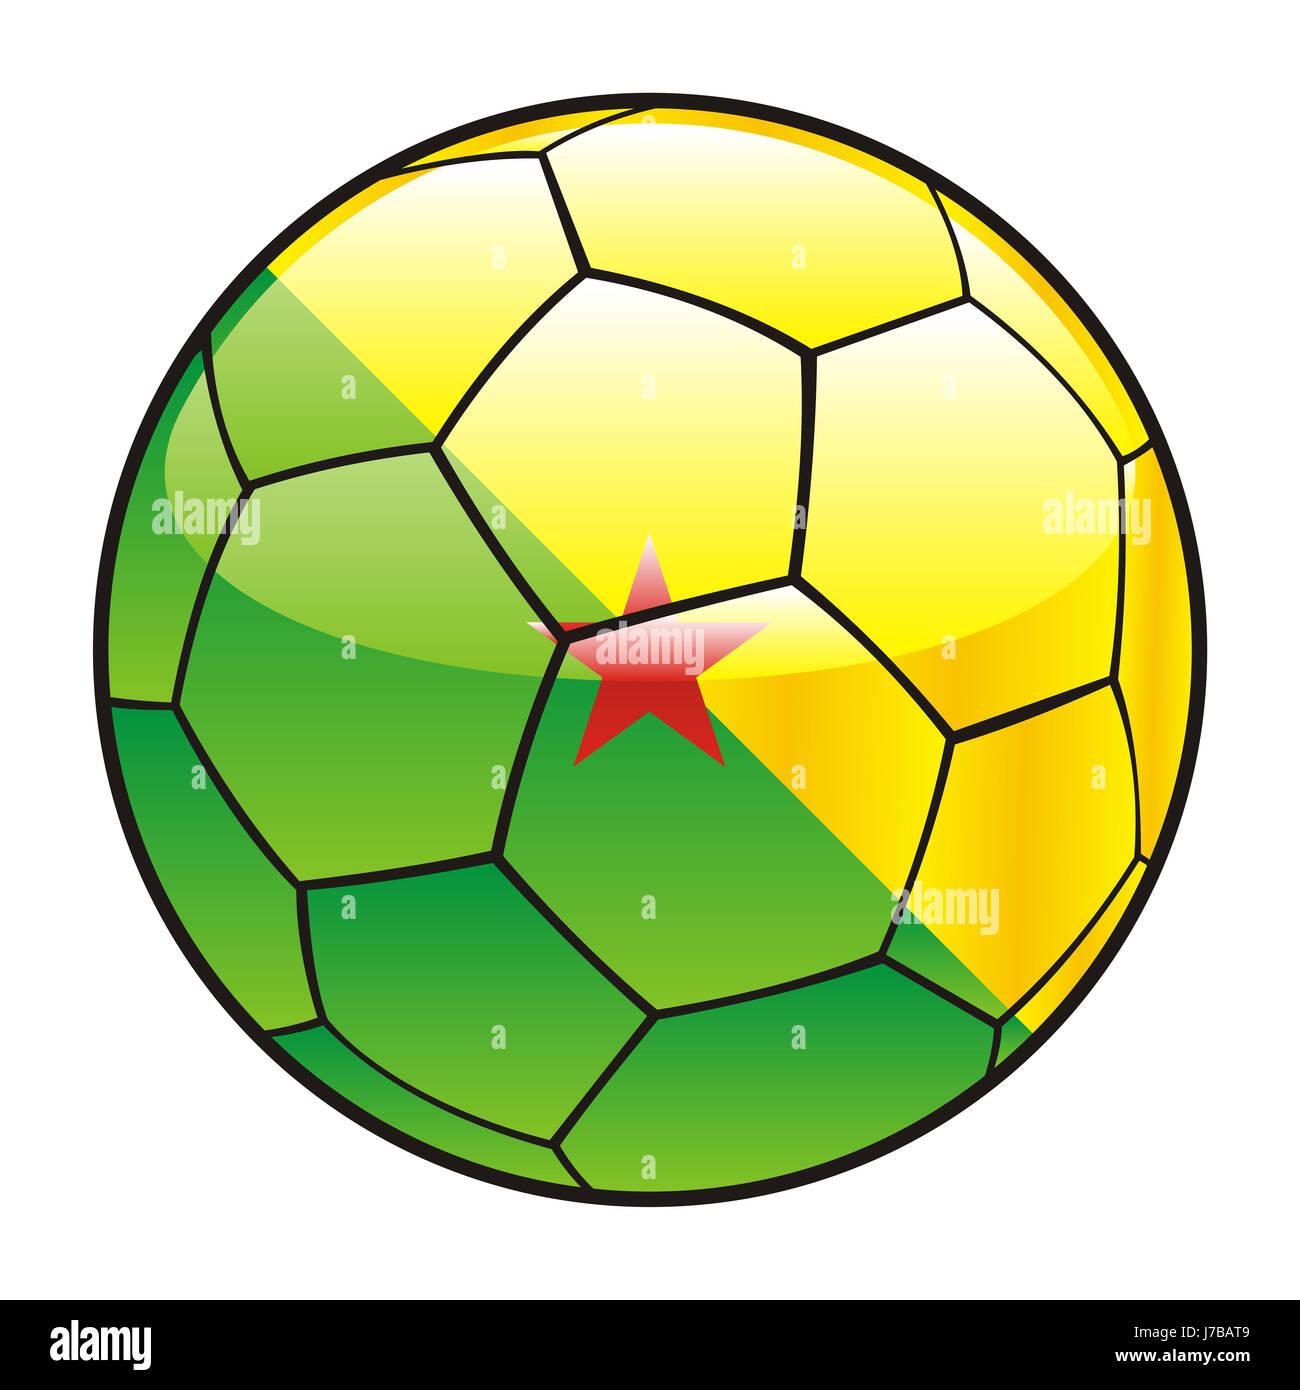 ball illustration flag french vector sport sports soccer football sport sports - Stock Image